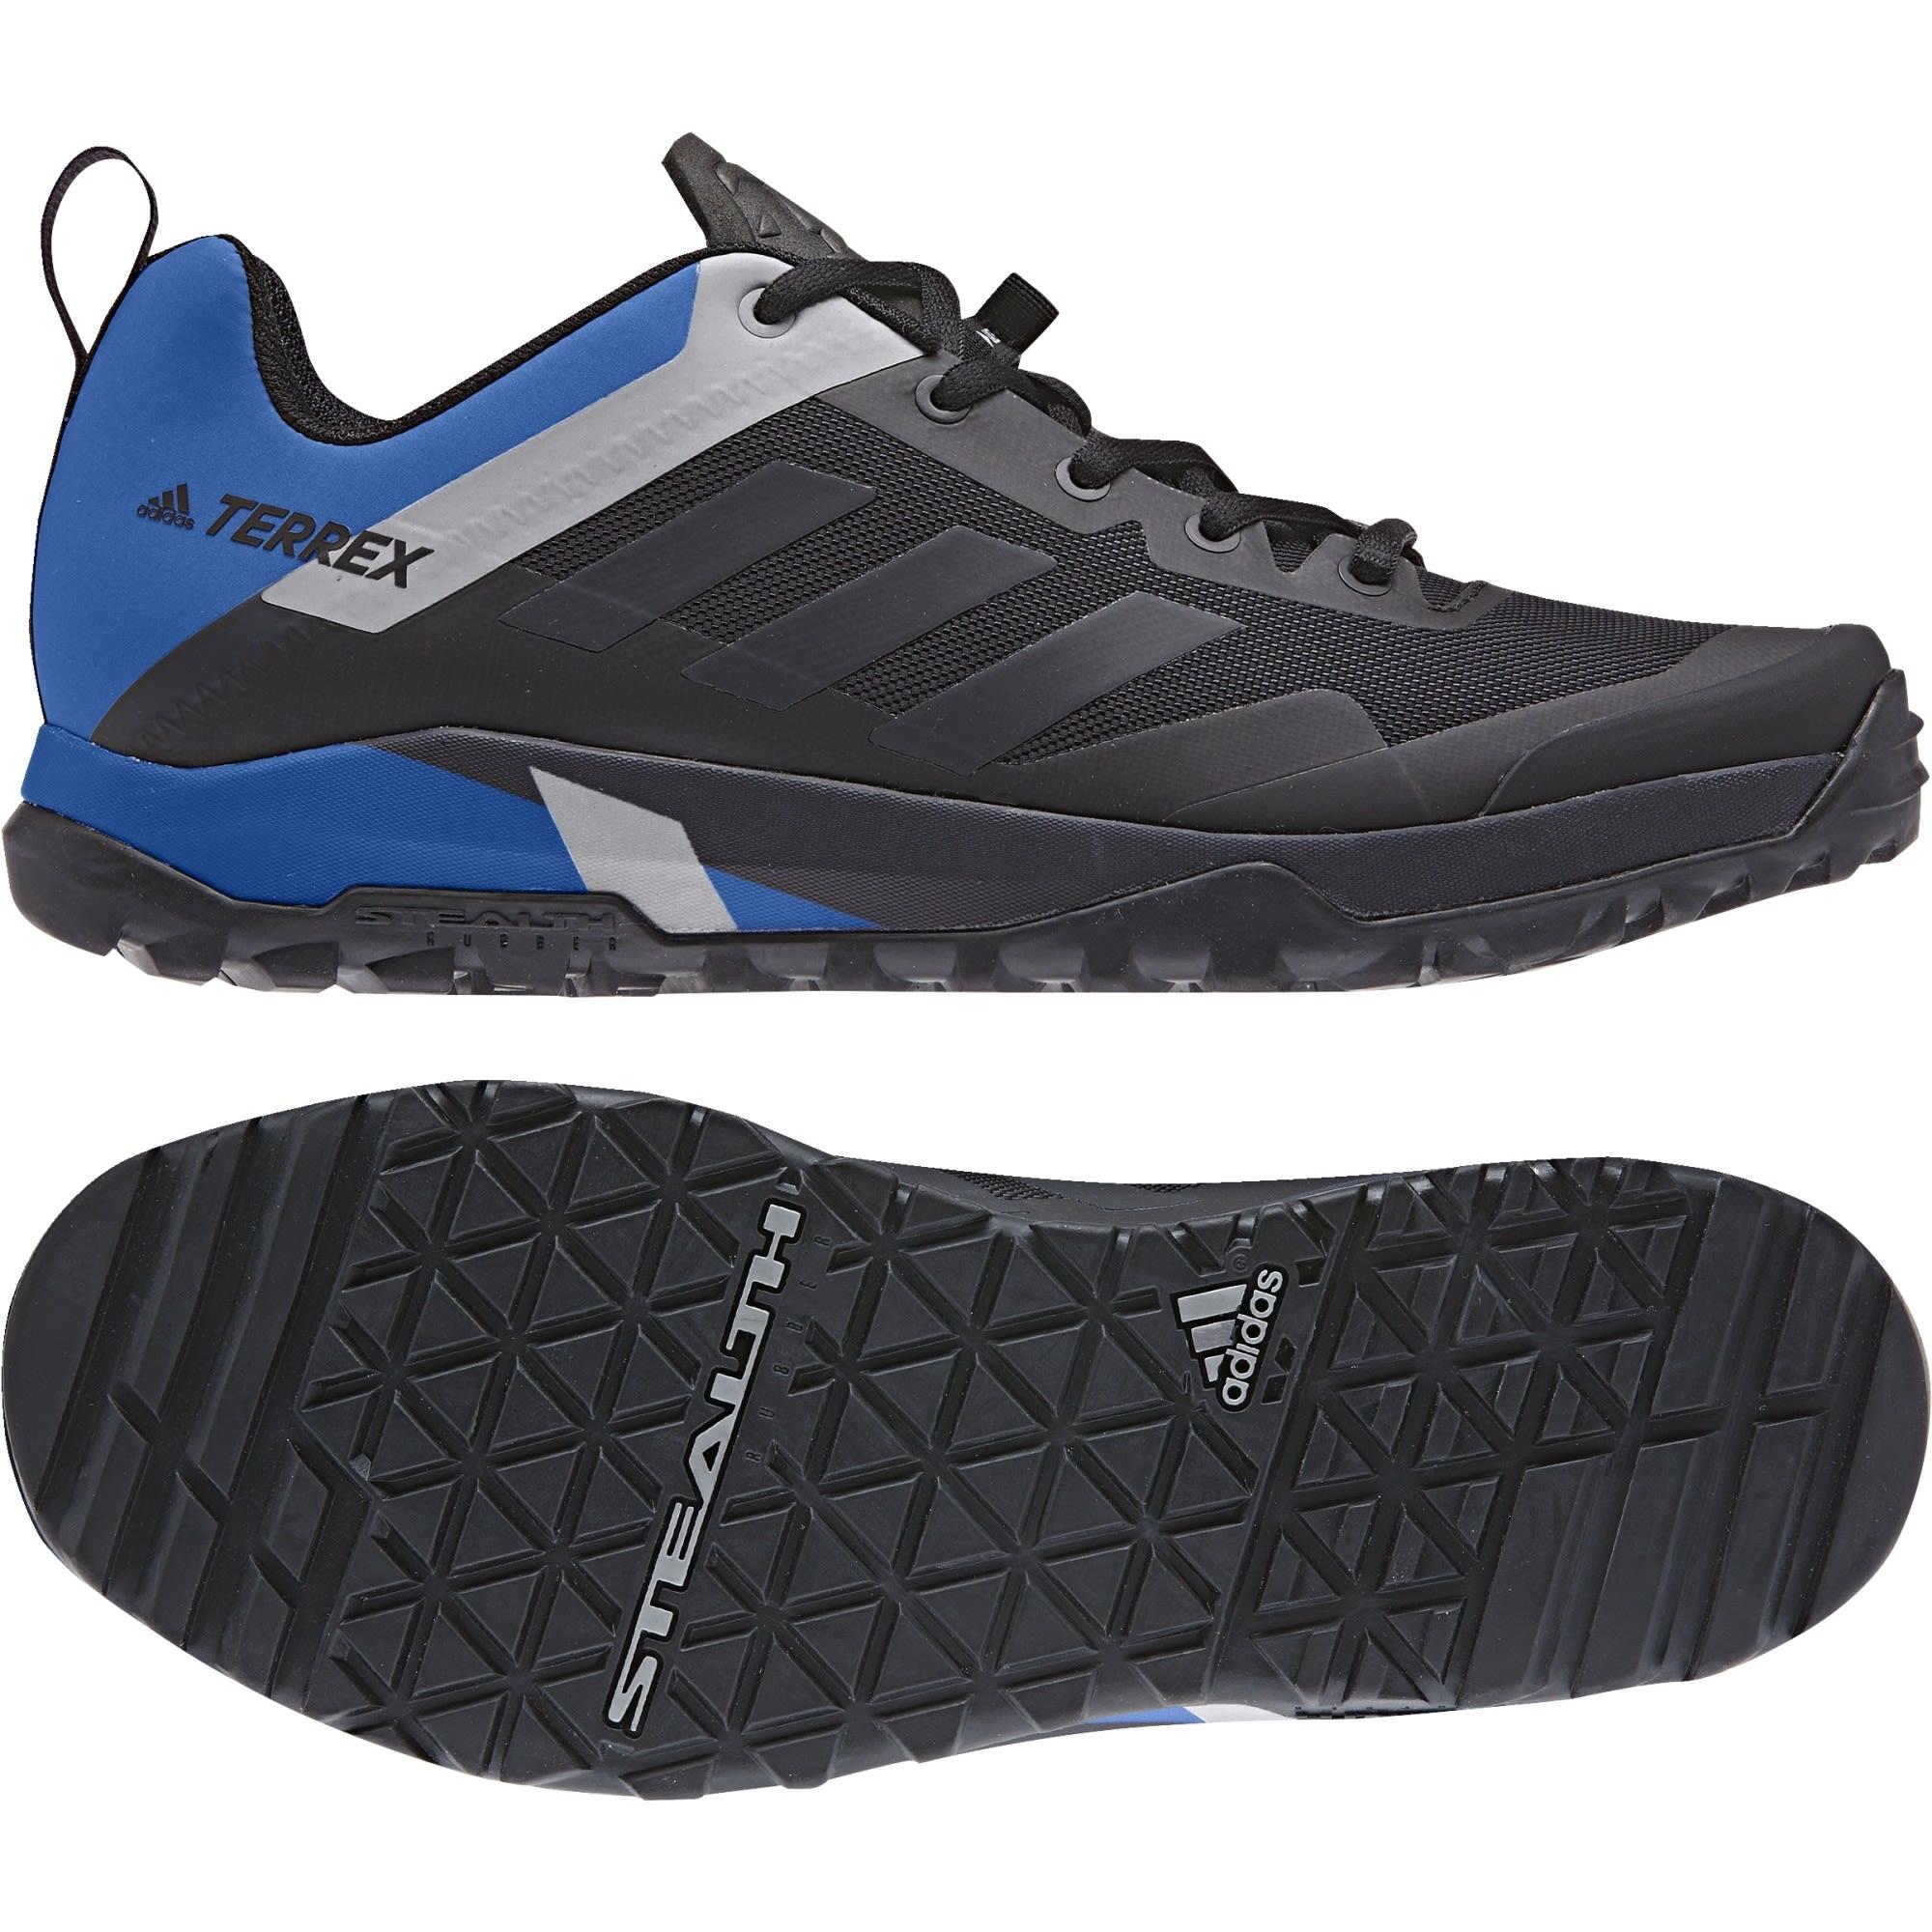 adidas Terrex Trail Cross SL Schwarz, Male EU 46 -Farbe Core Black -Carbon -Blue